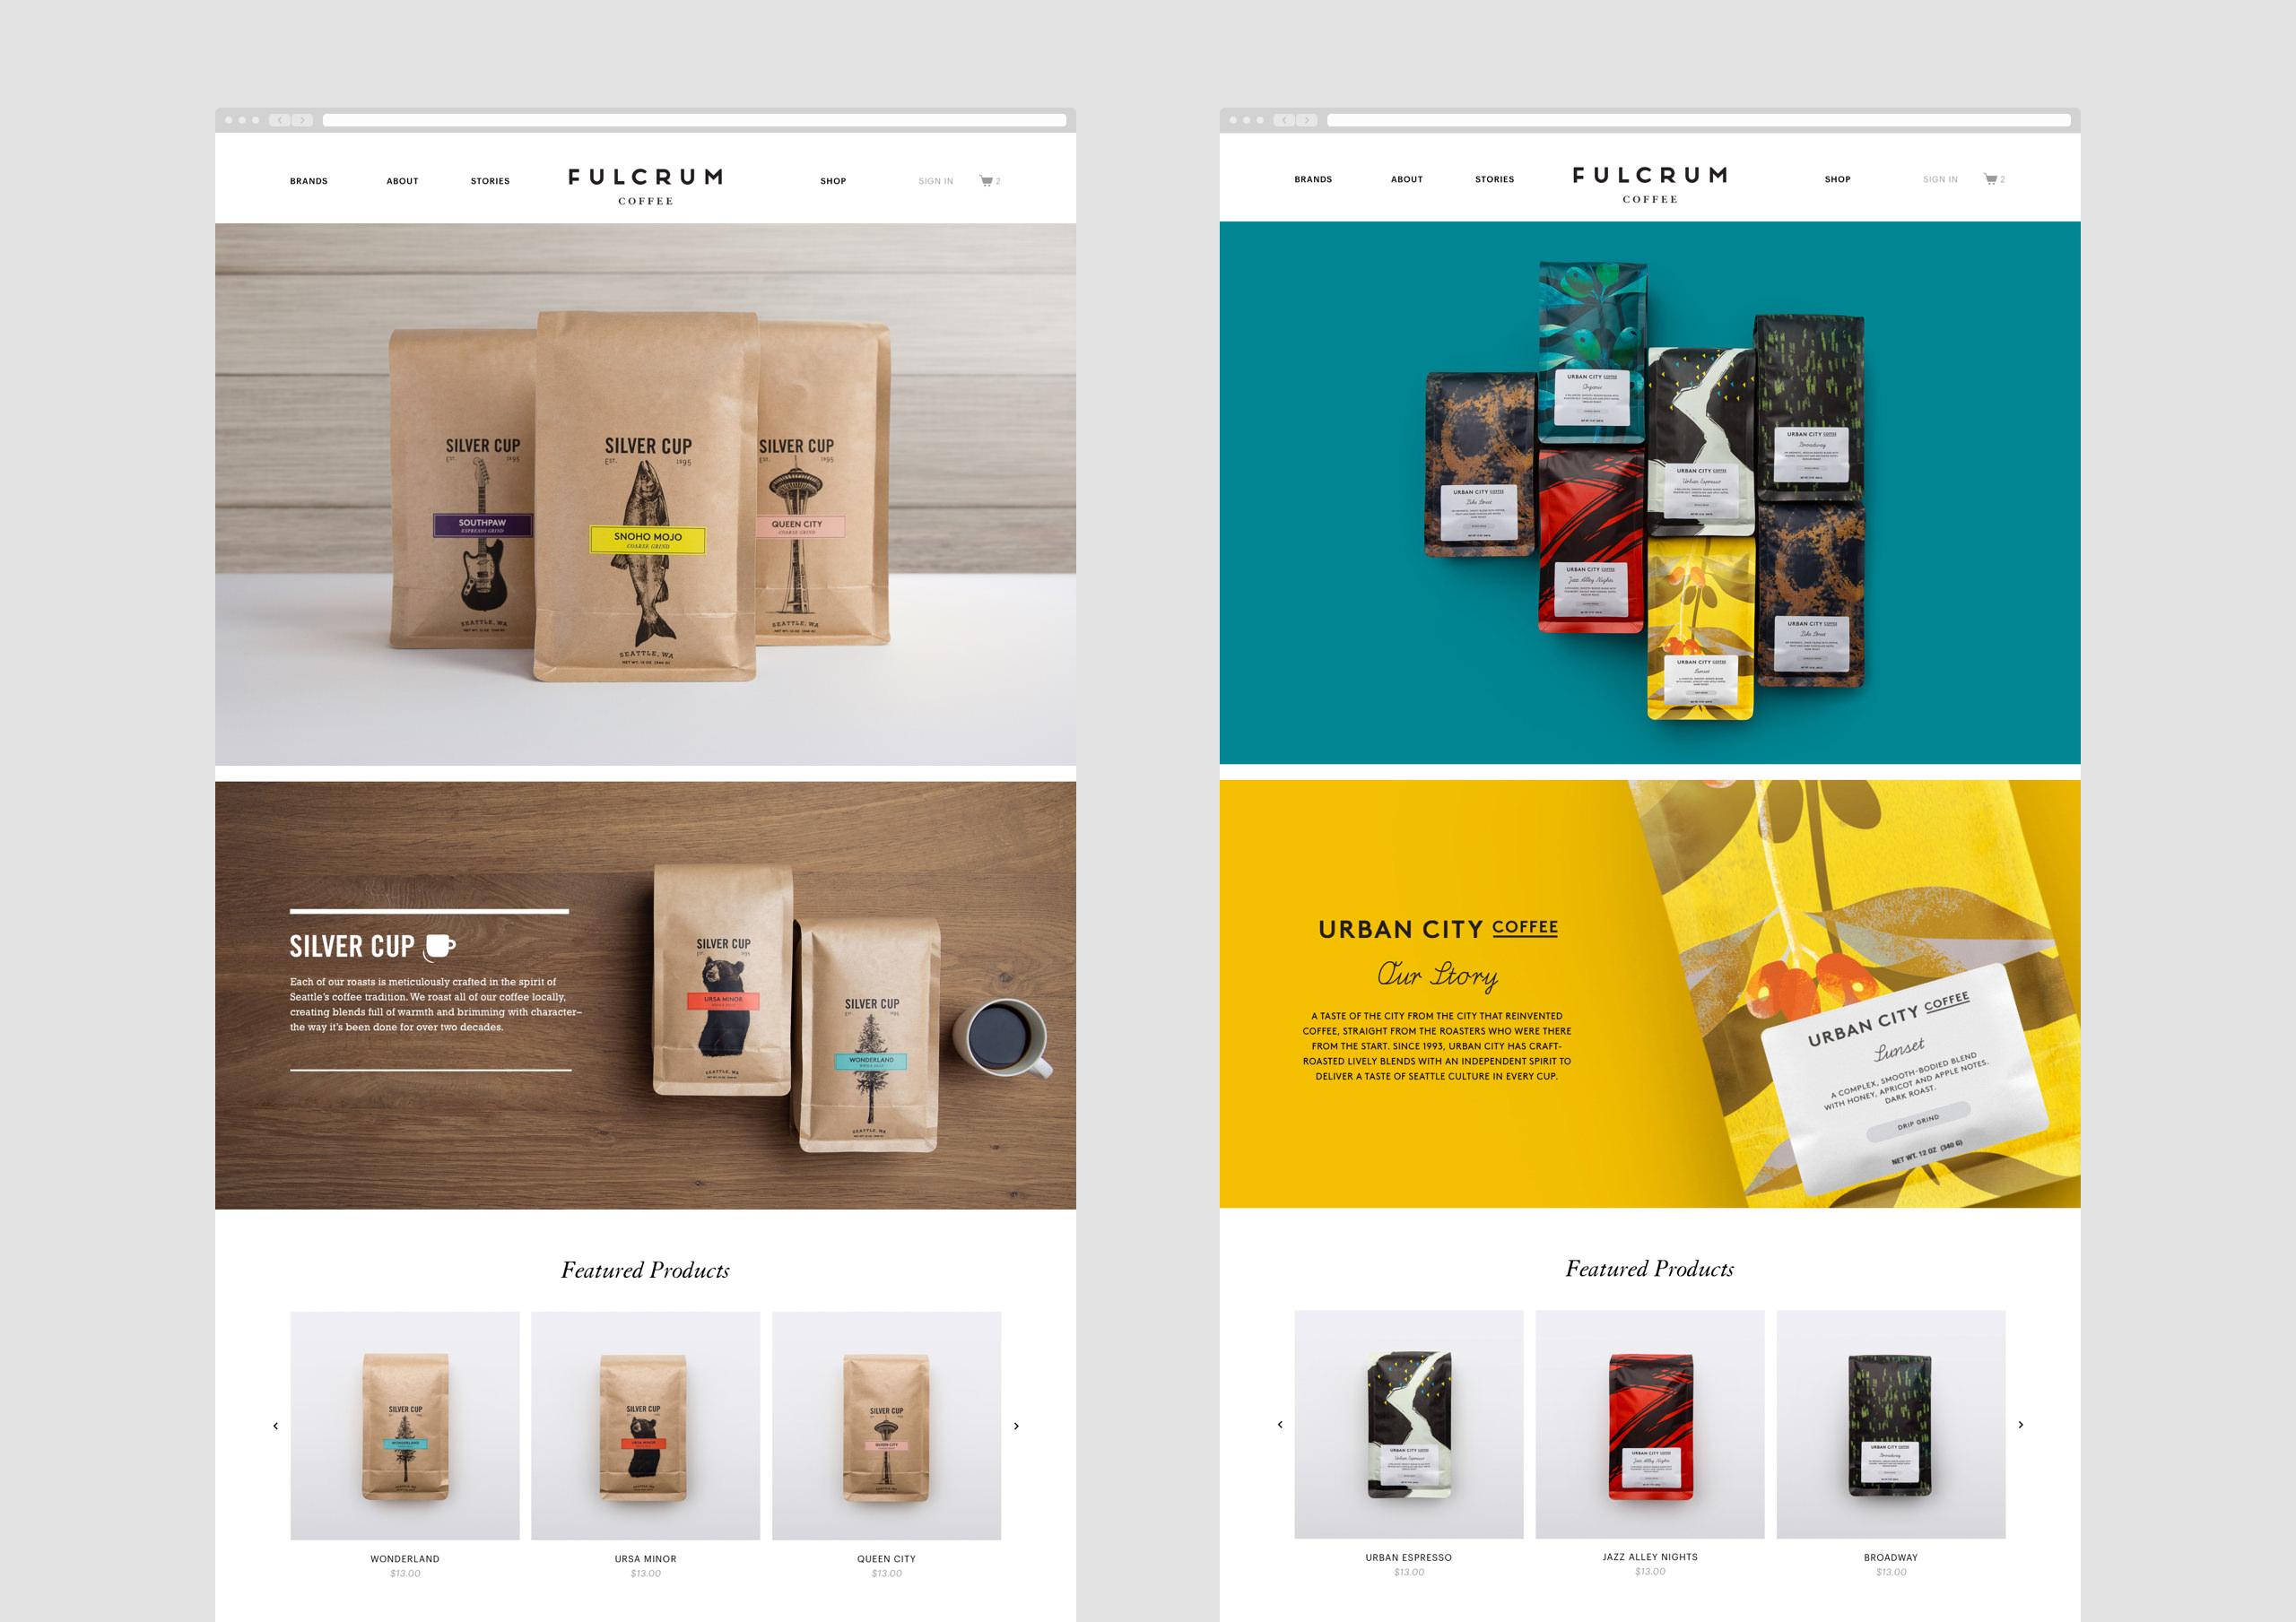 tolleson-case-study-fulcrum-coffee-interactive-05